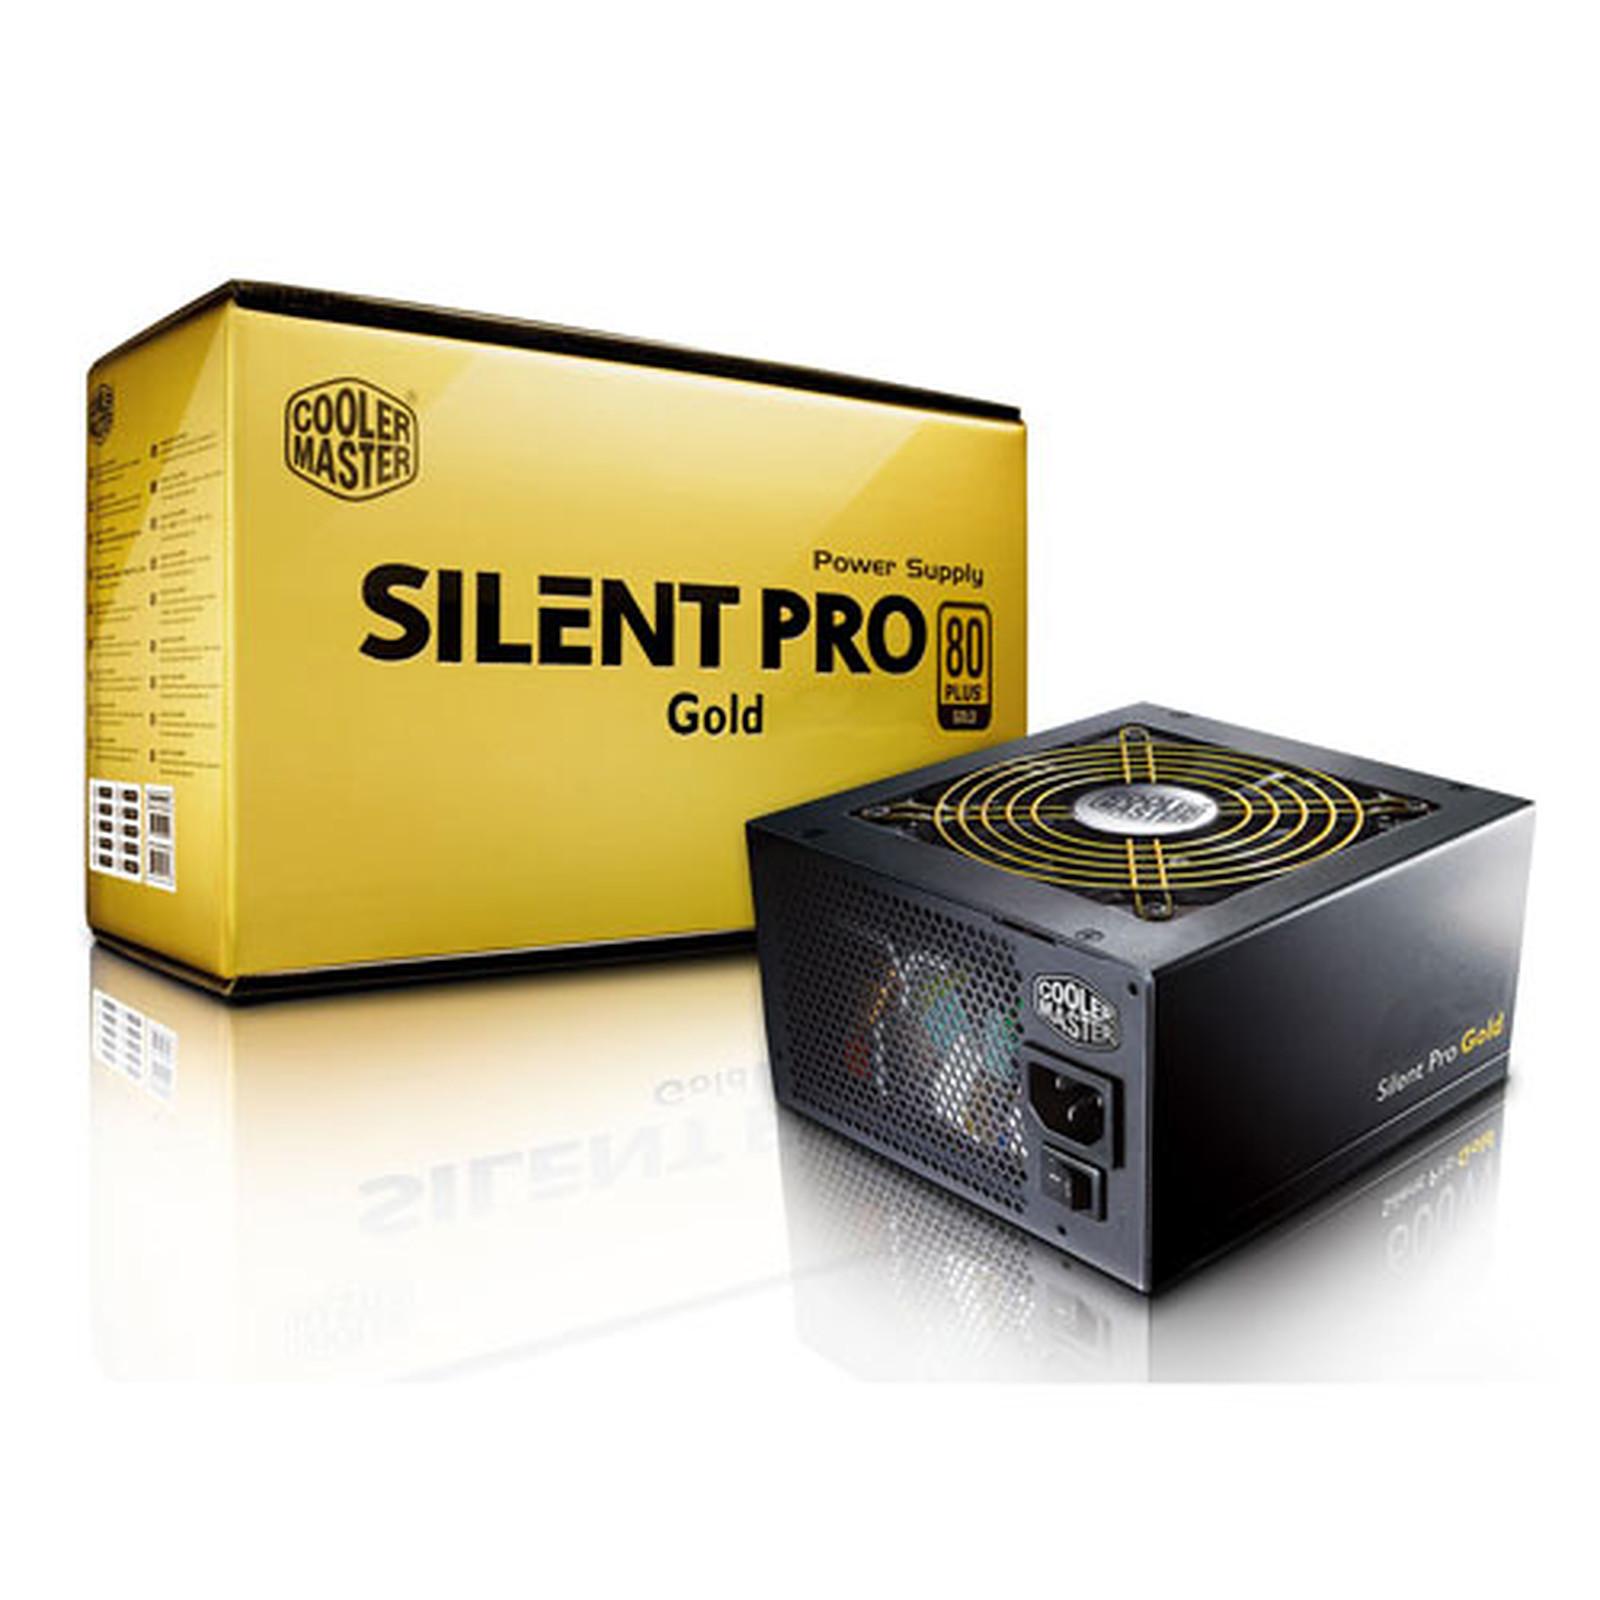 Cooler Master Silent Pro Gold 550W 80PLUS Gold